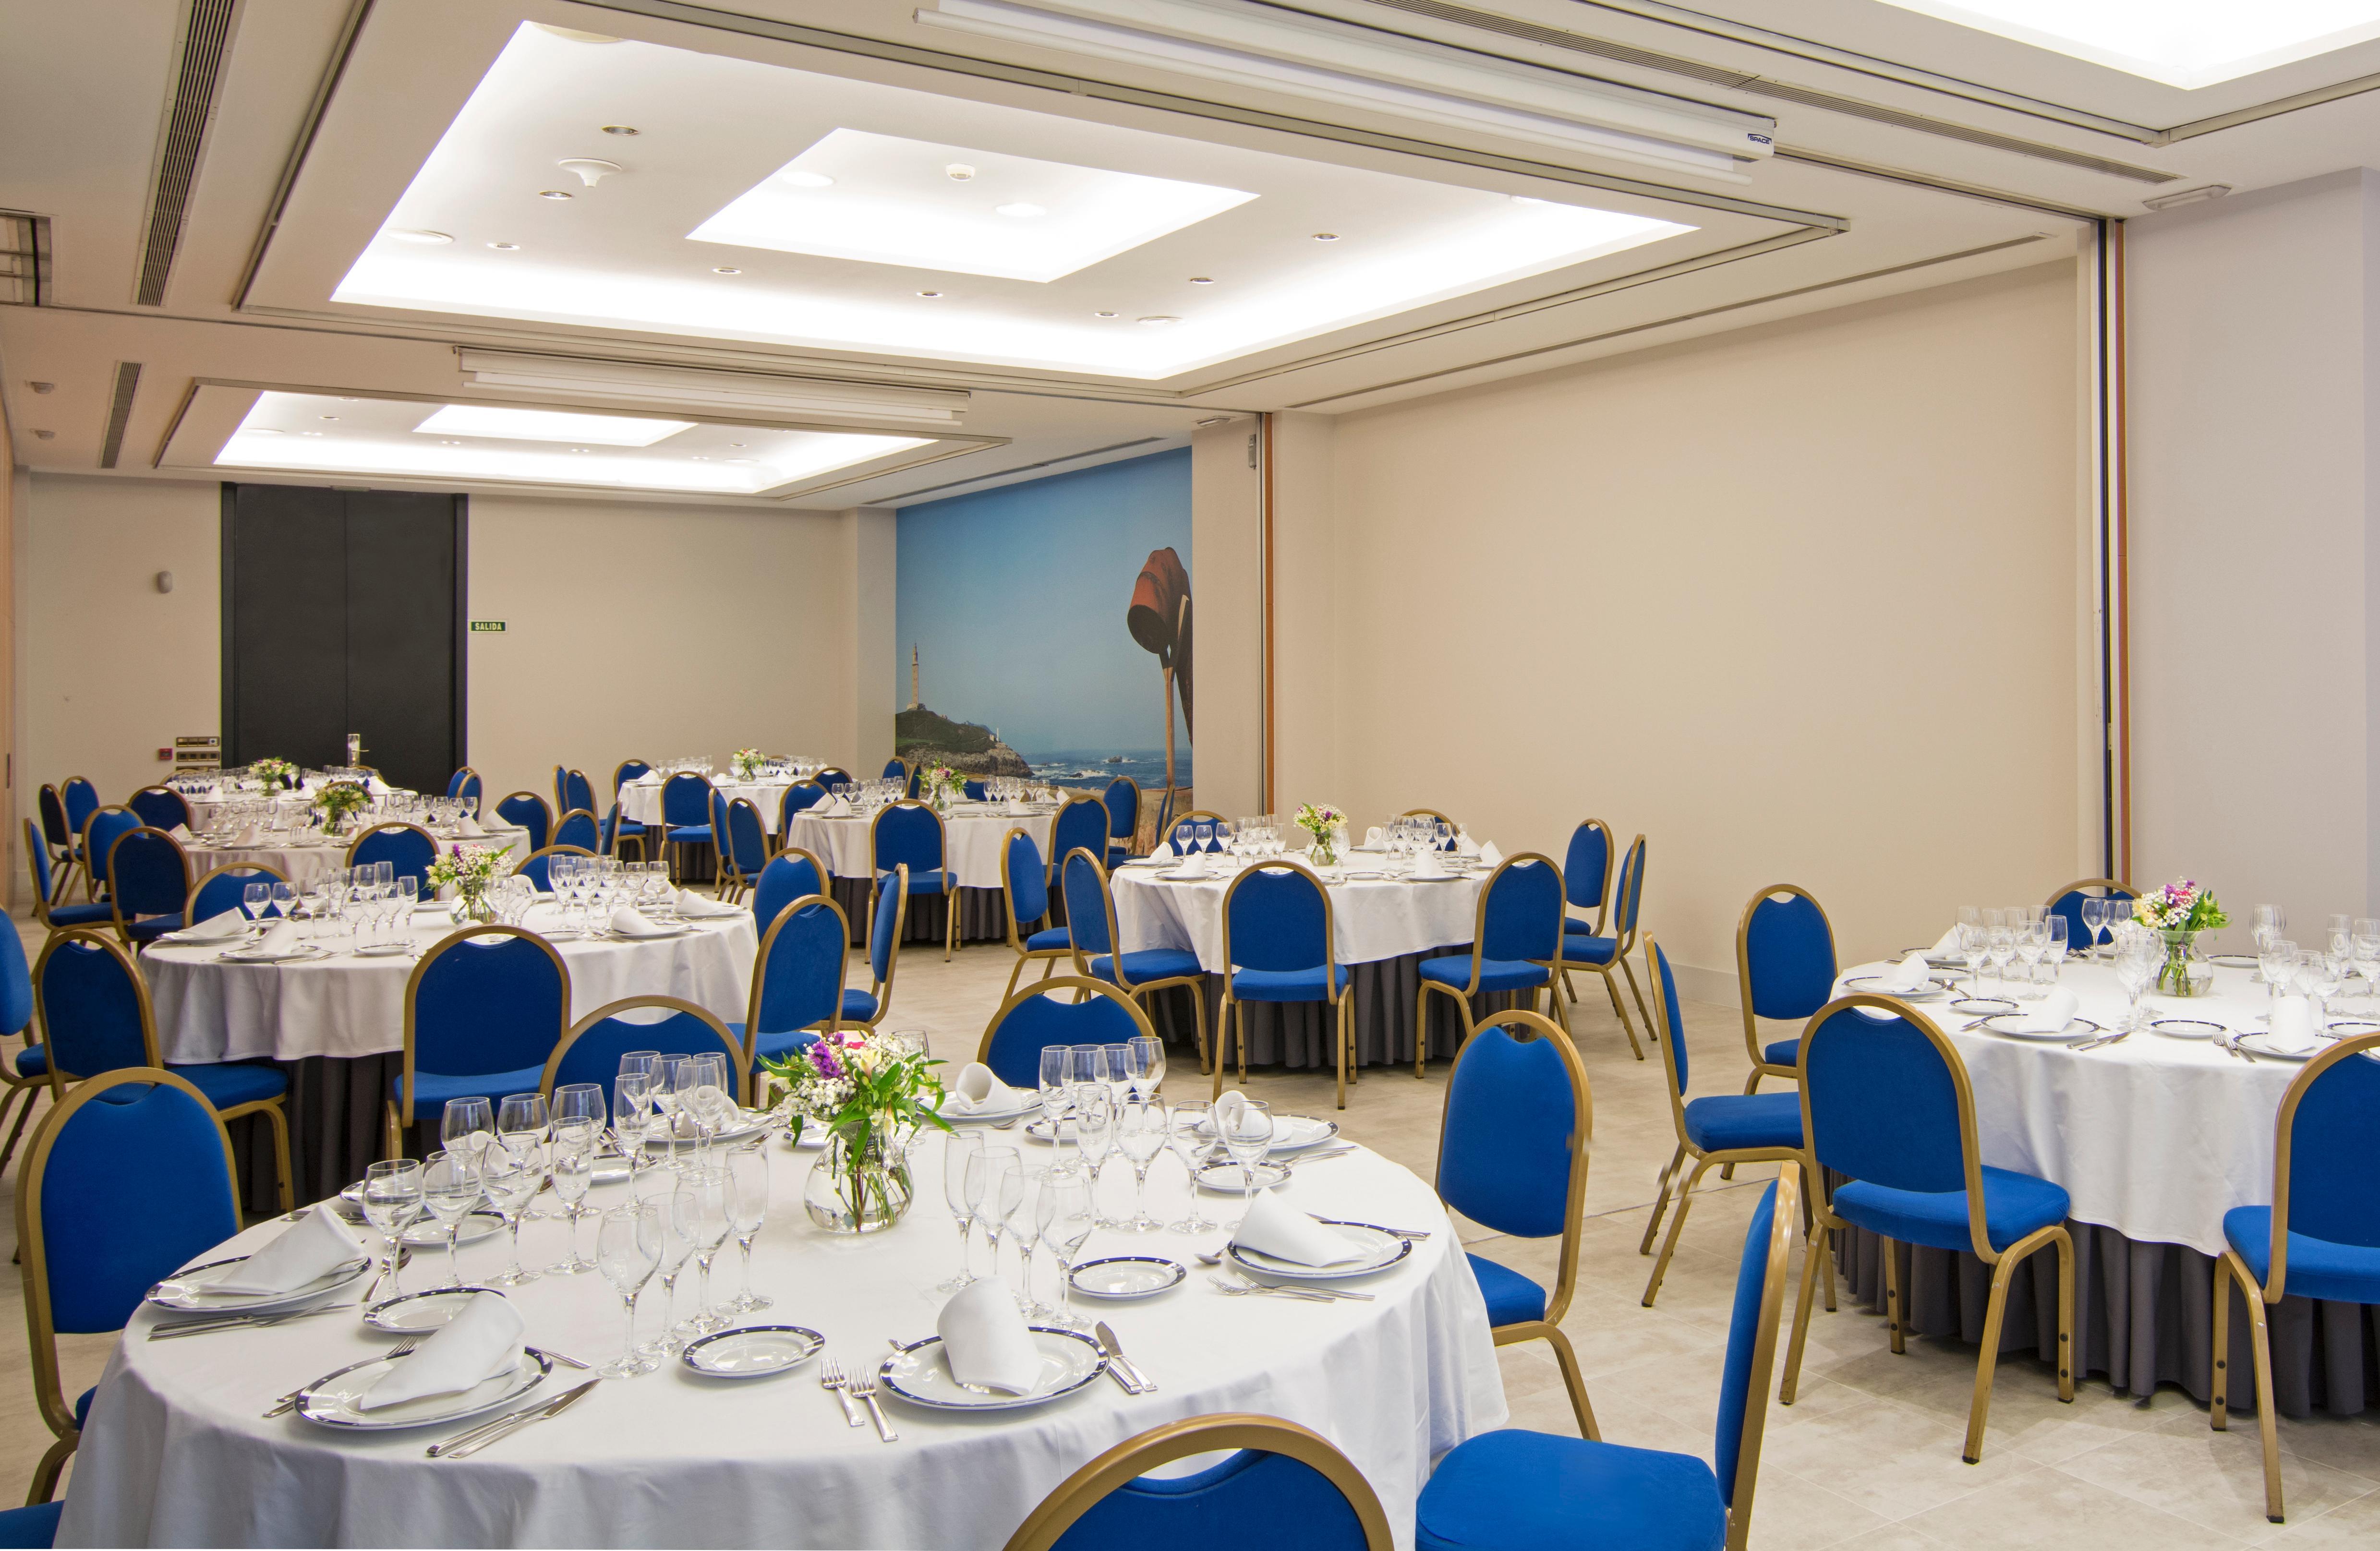 3. Tryp Coruña Hotel